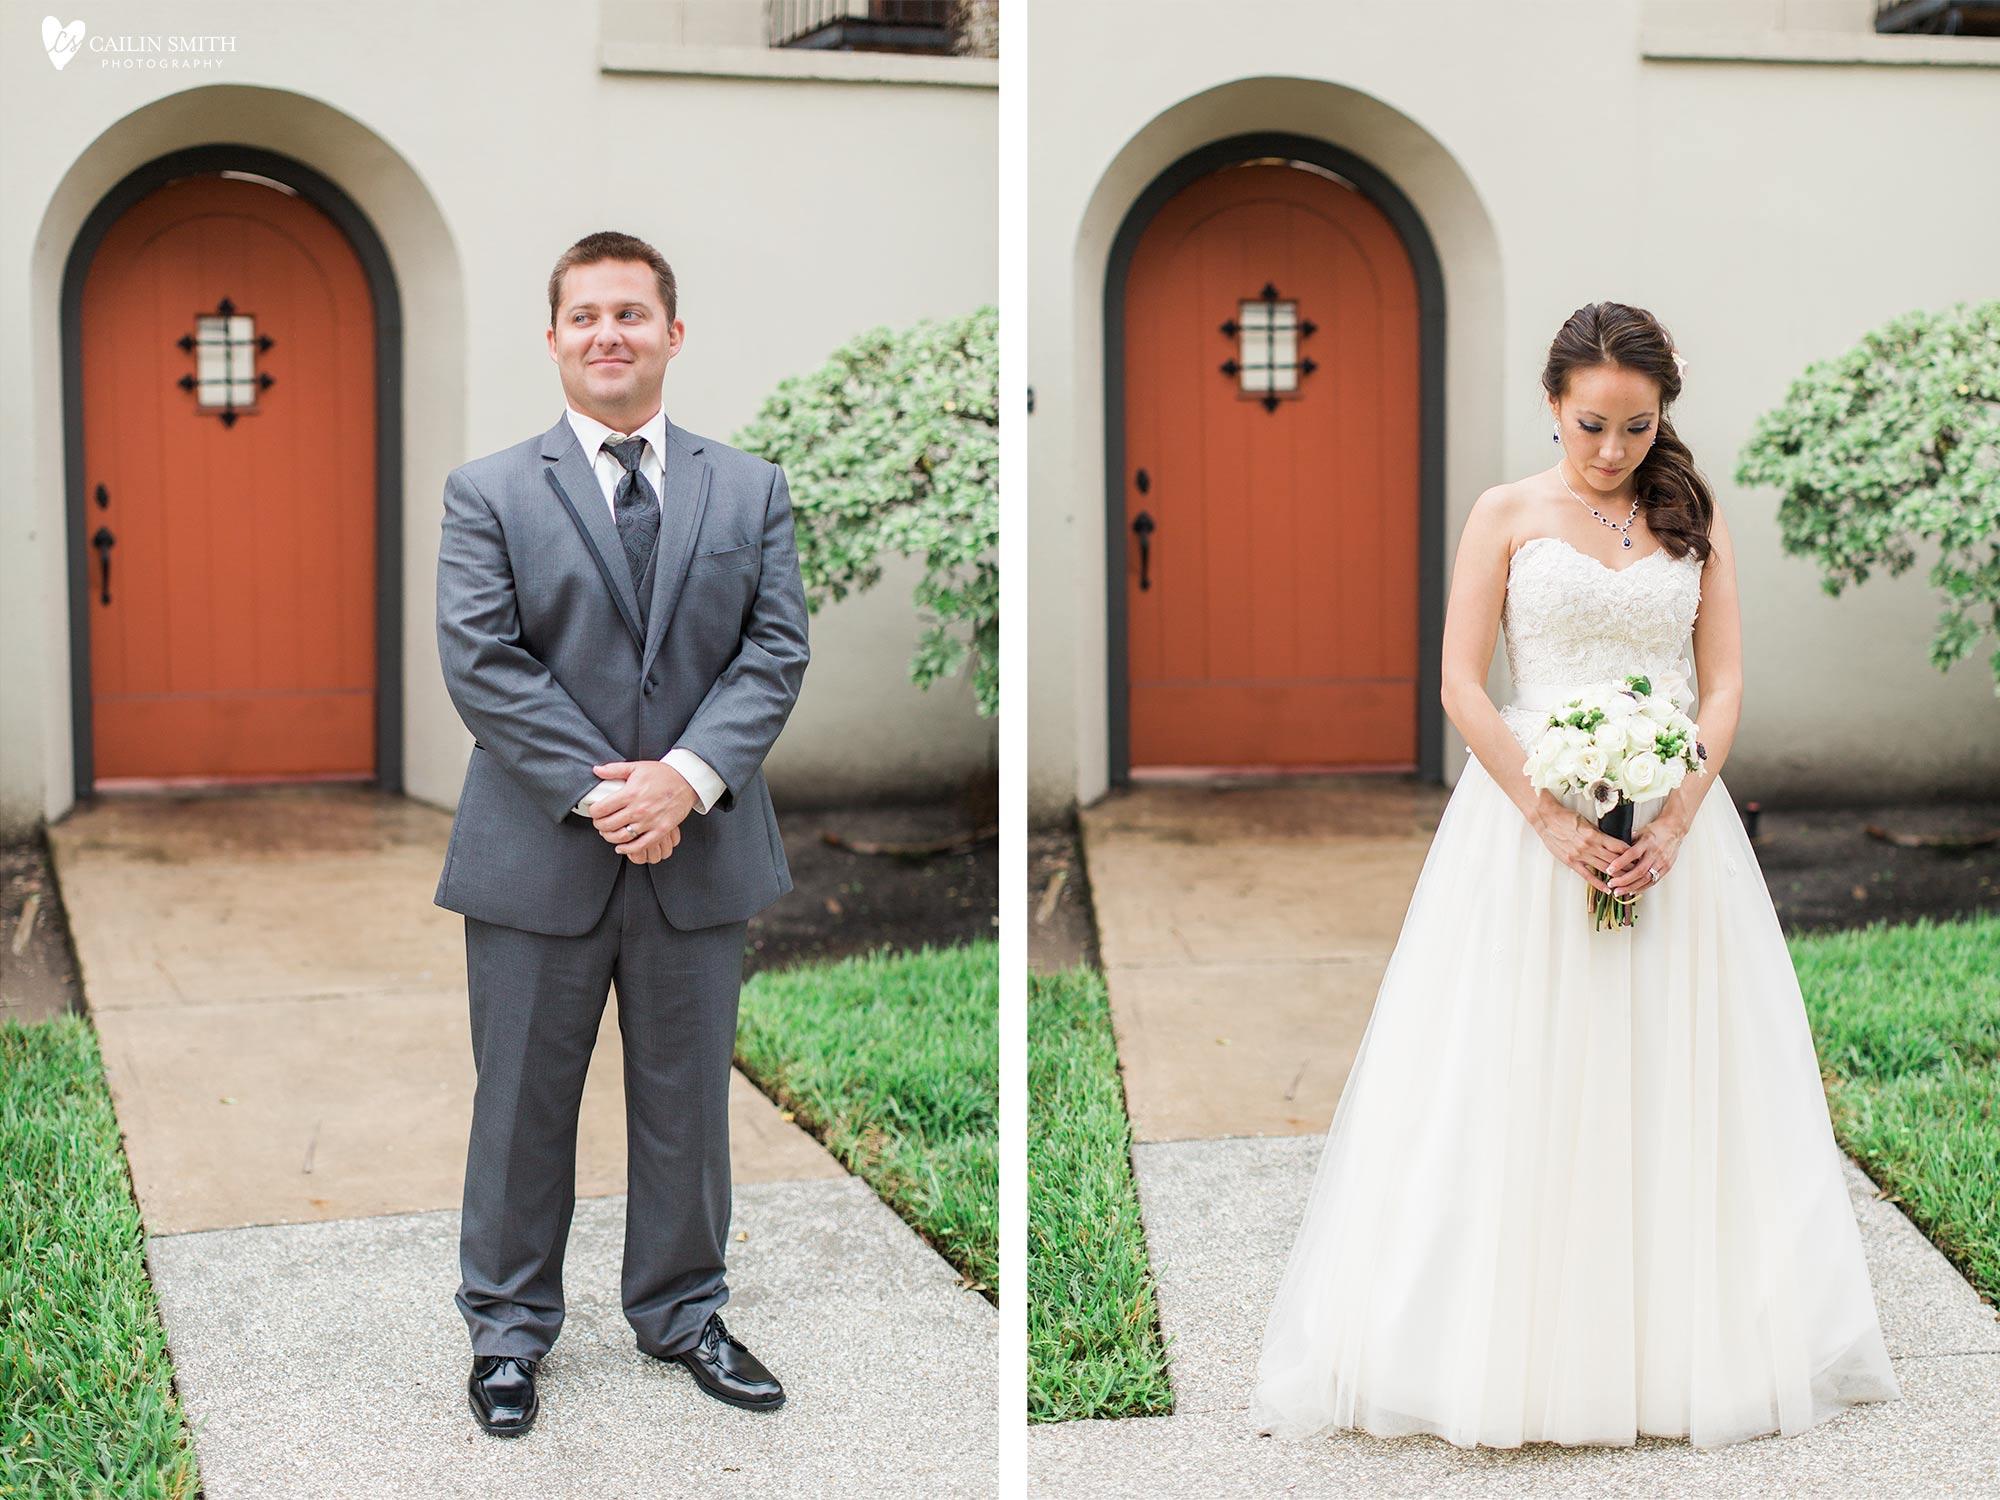 Jenifer_Dewey_Treasury_on_The_Plaza_Wedding_Photography_081.jpg